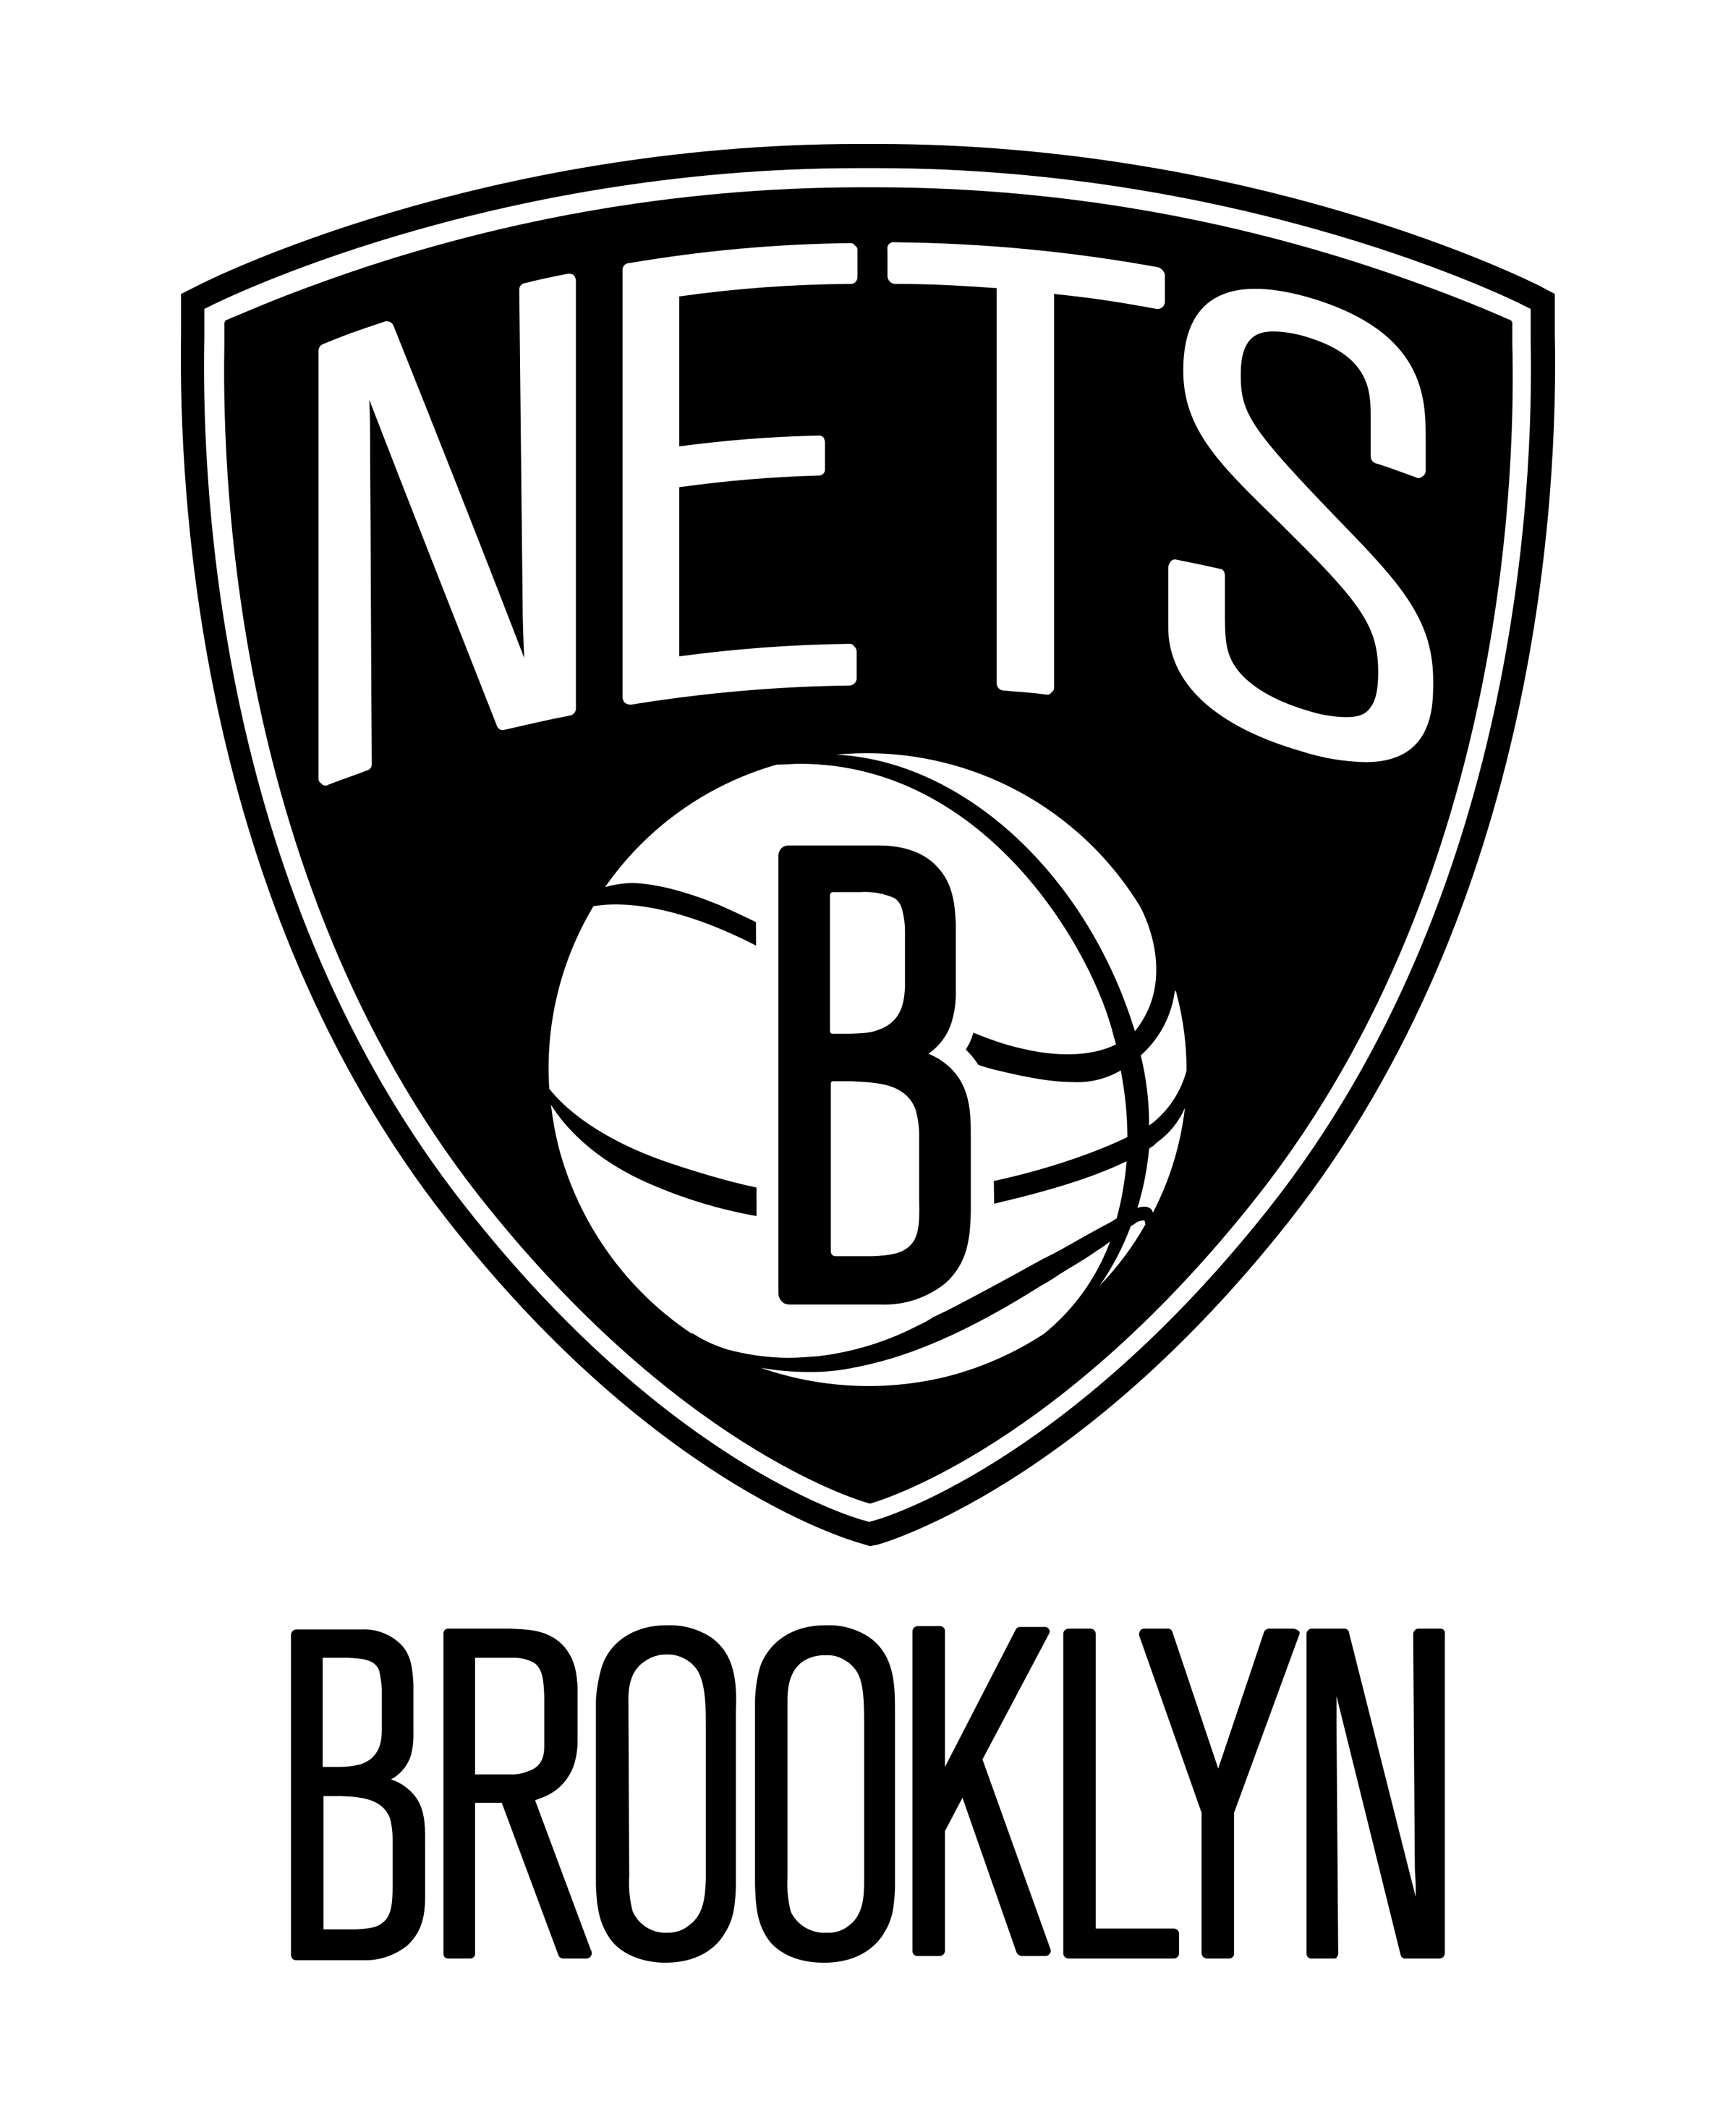 Brooklyn Nets logo transparent - Brooklyn Nets PNG